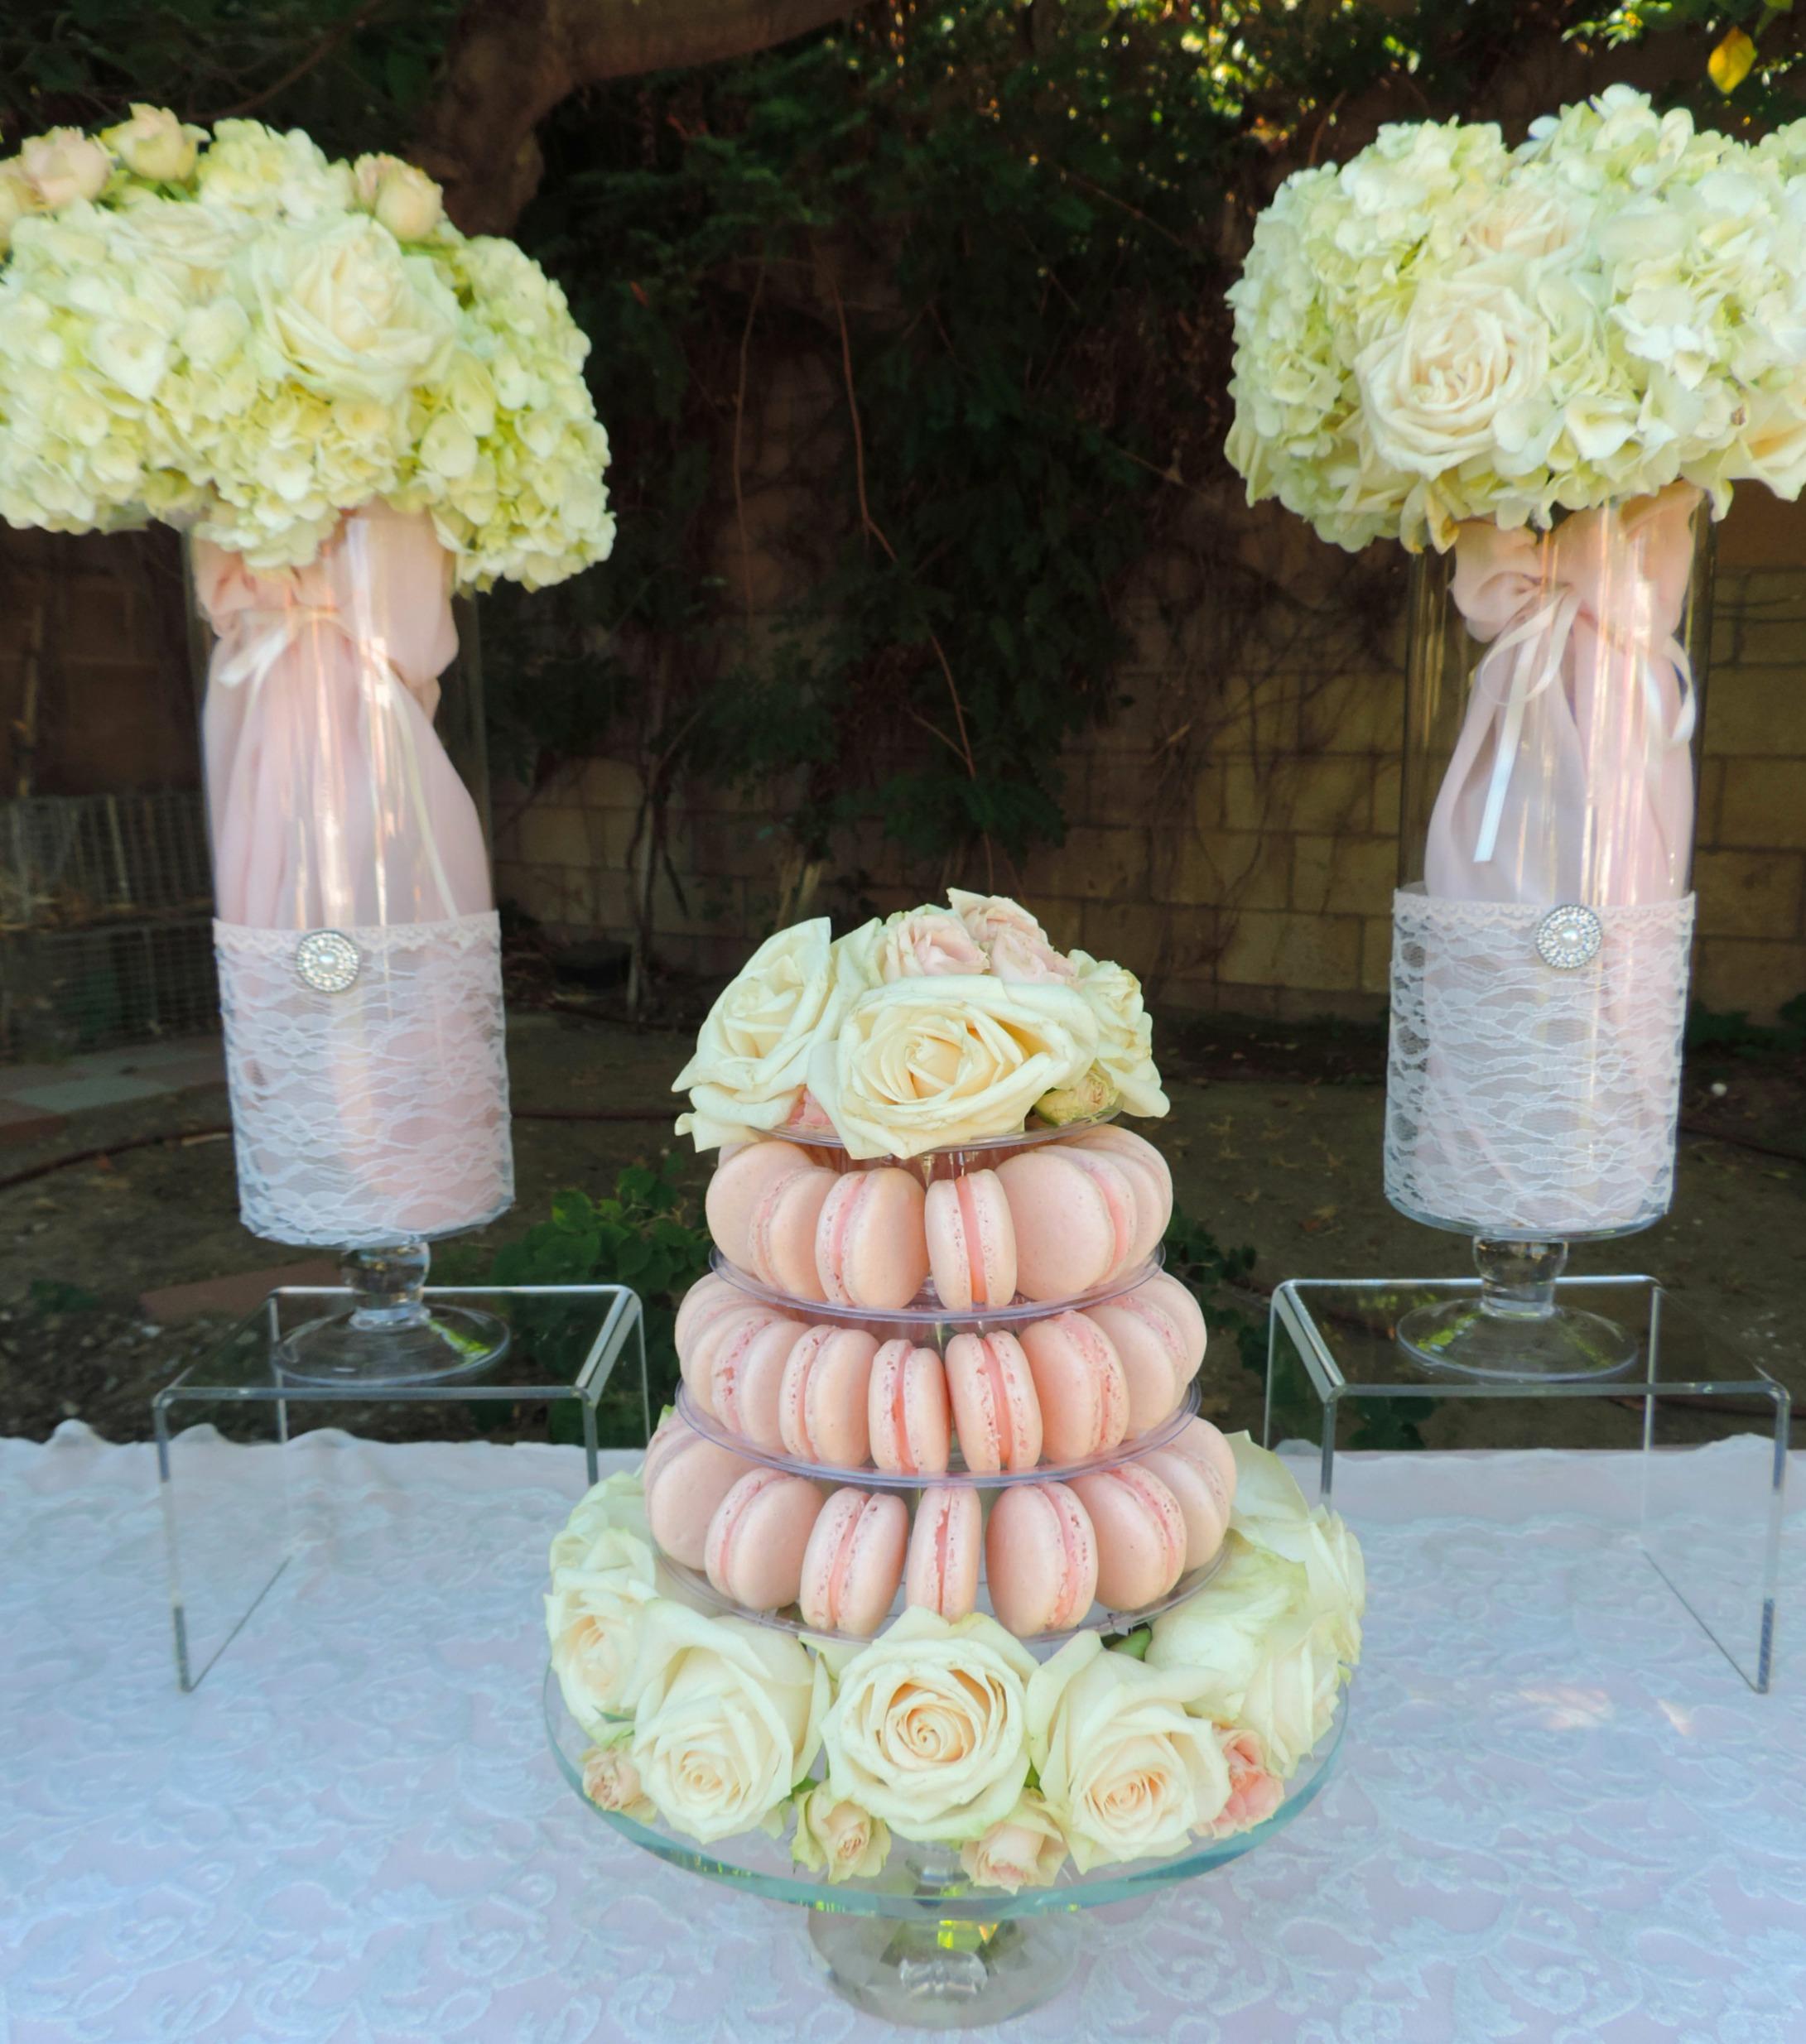 Macron Tower-Macroons-Wedding dessert ideas-wedding -summer wedding-spring wedding-wedding ideas-backyard wedding-garden wedding-www.SugarPartiesLA.com.jpg